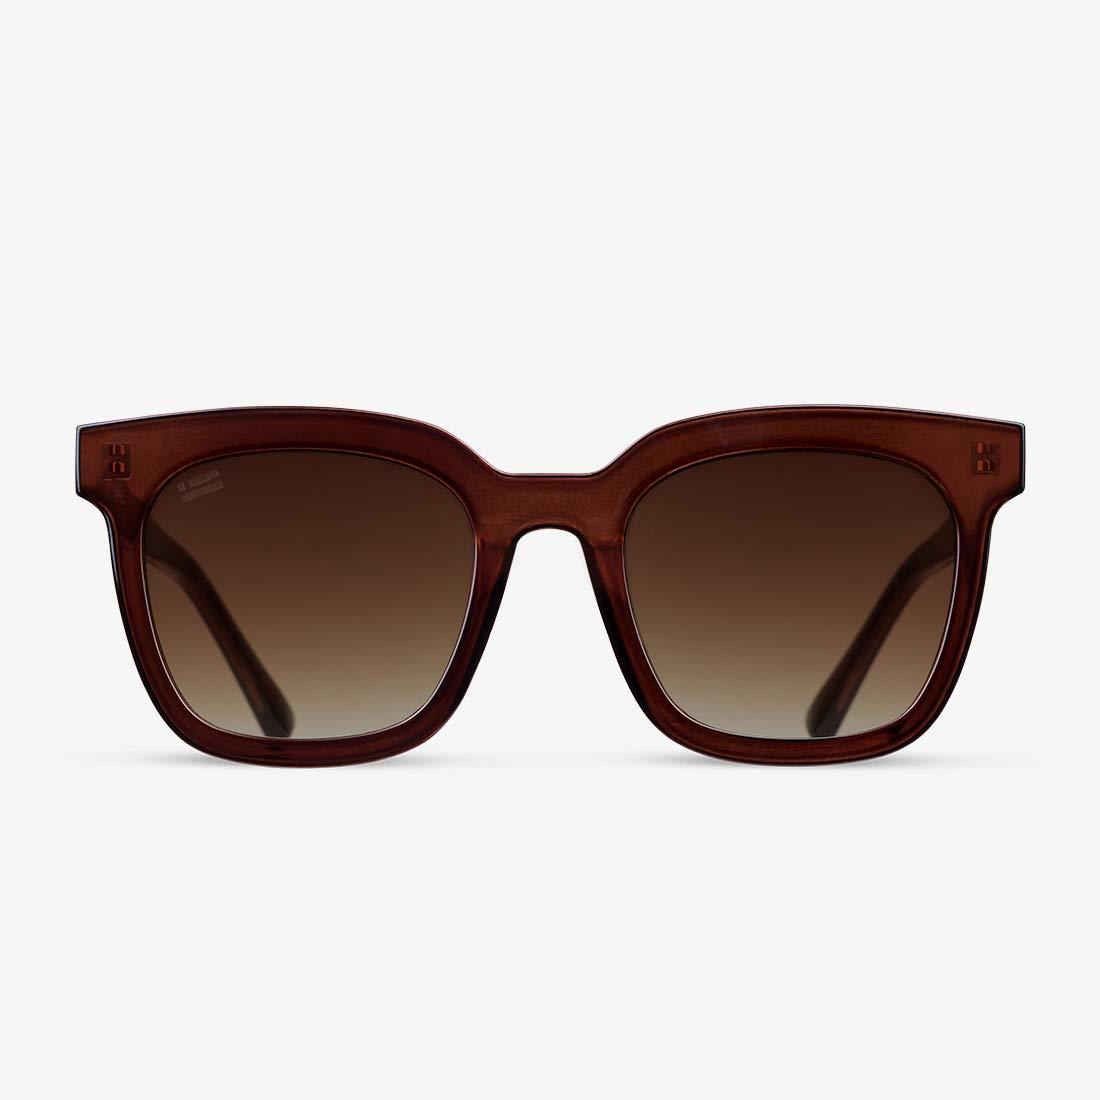 Franklin 993 Gafas de sol Marr/ón D 50 Unisex